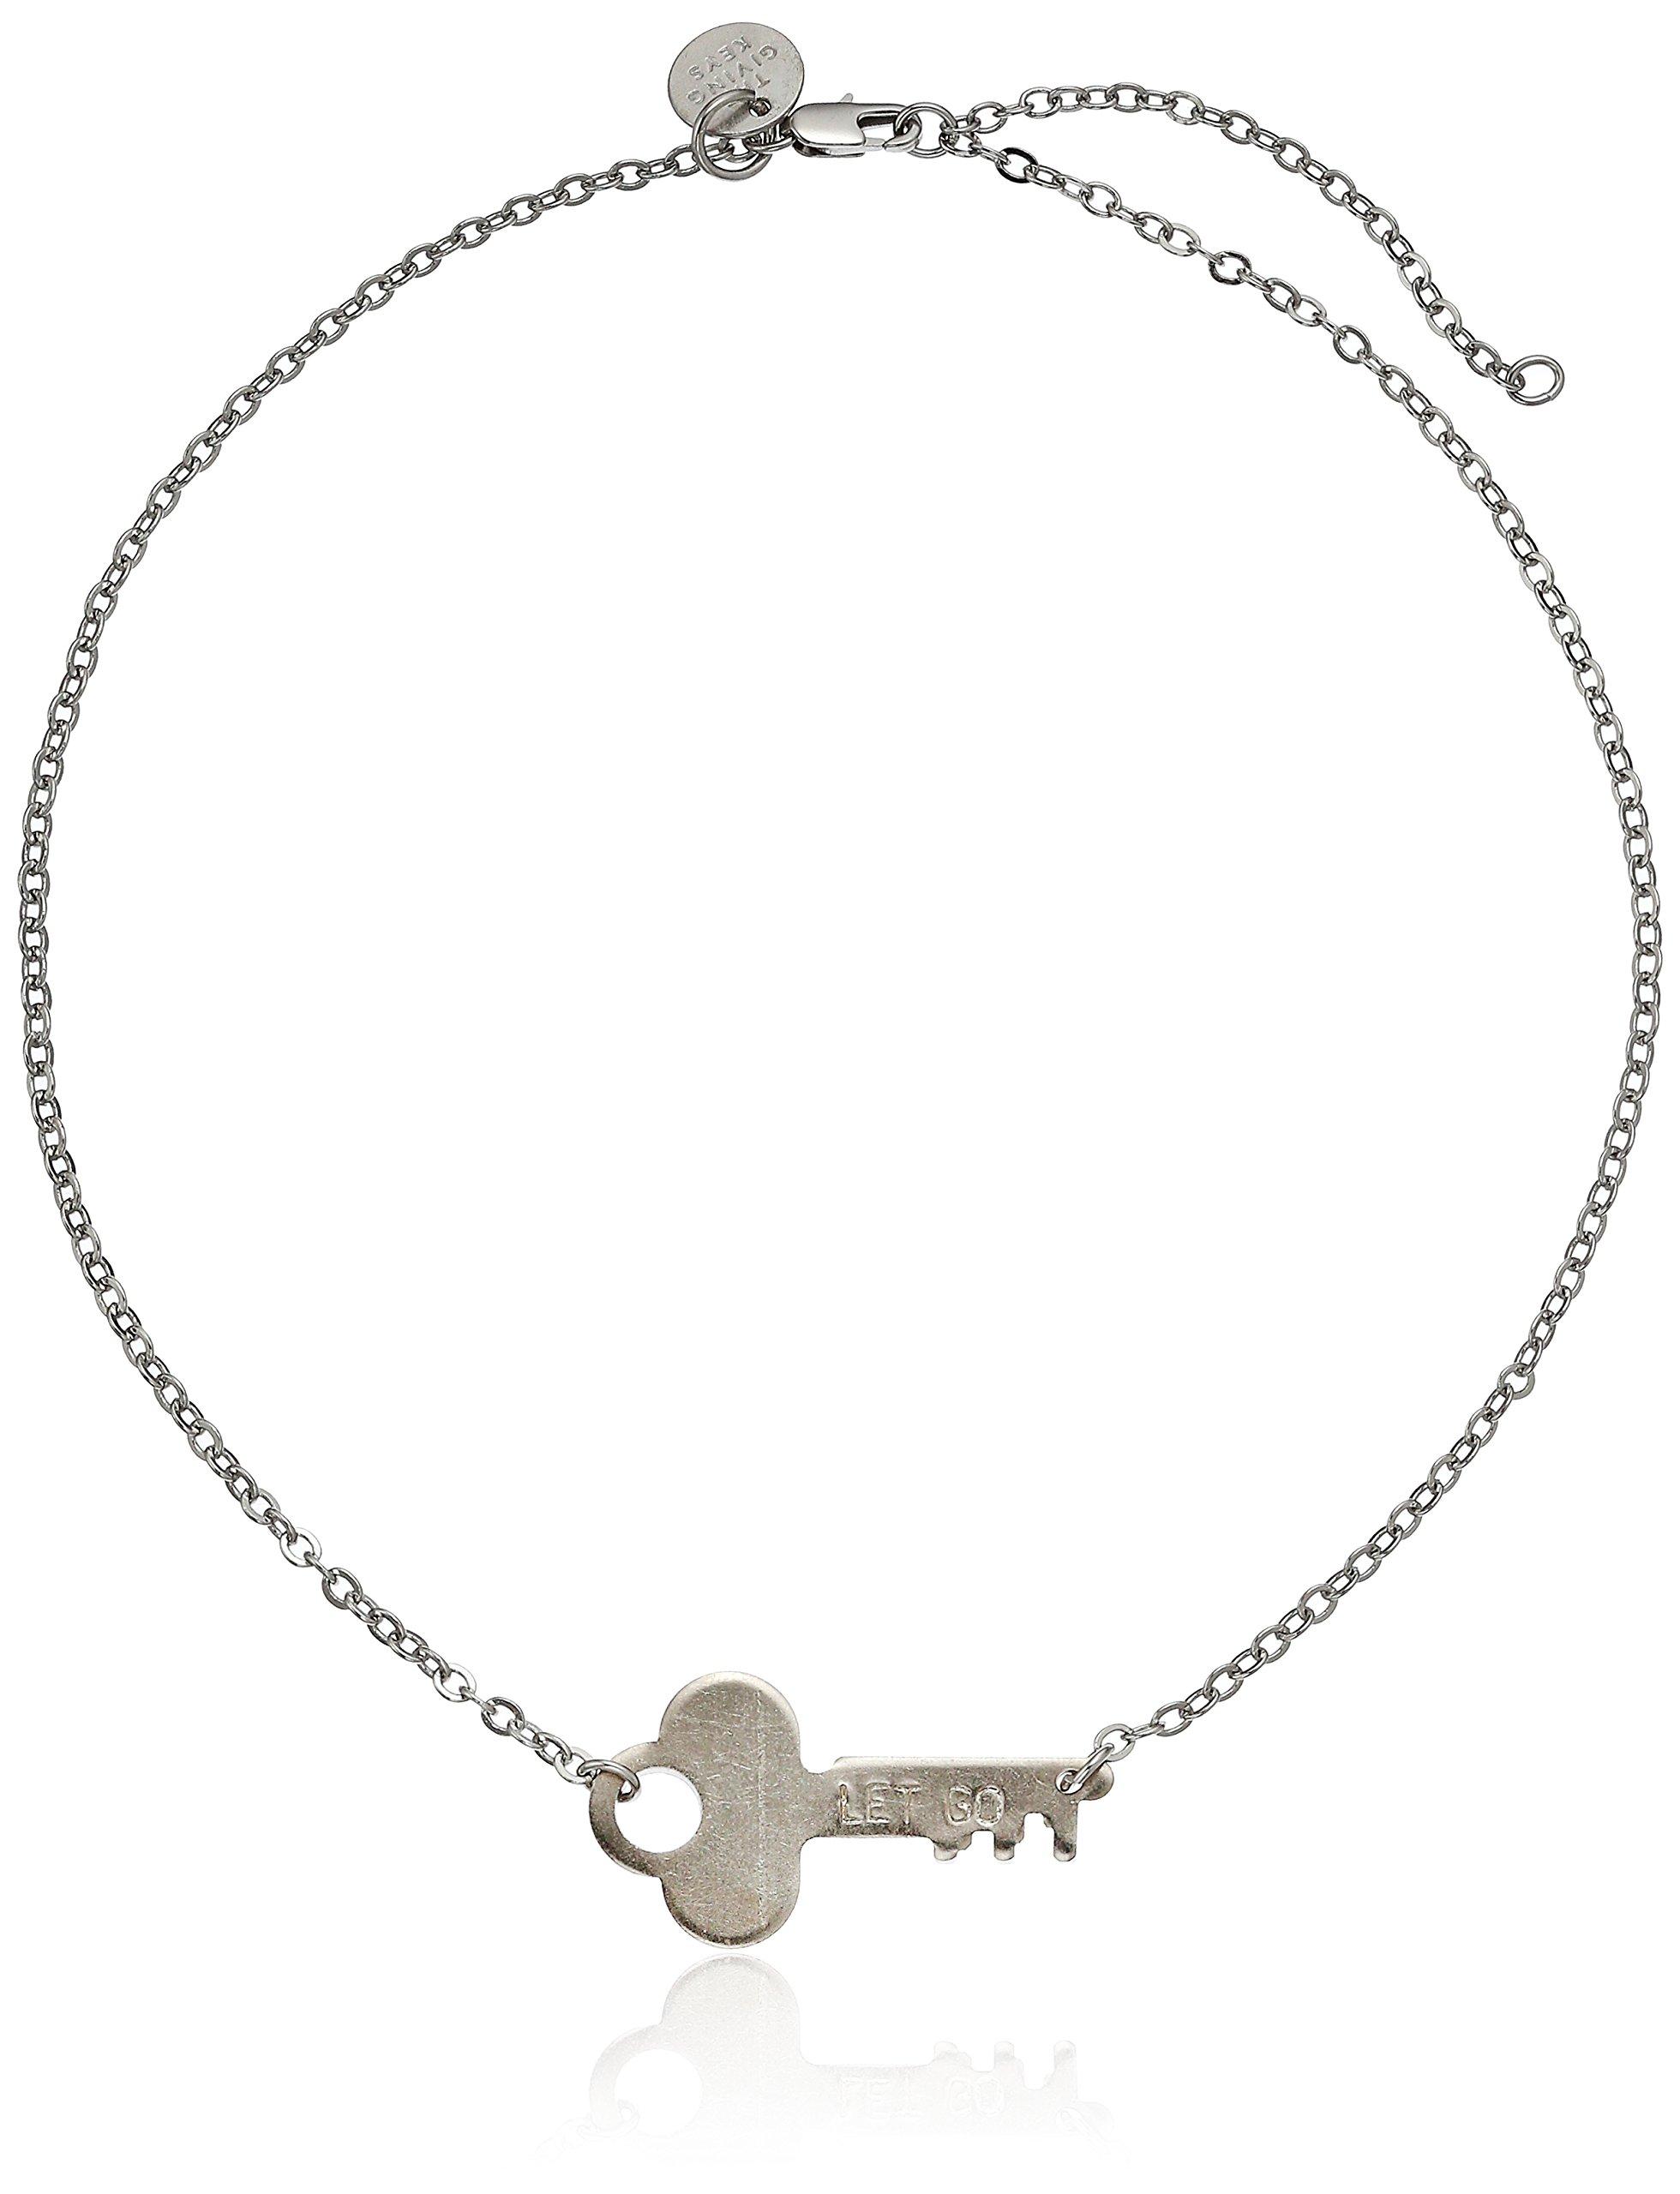 The Giving Keys Neverending Silver Choker Necklace LET GO